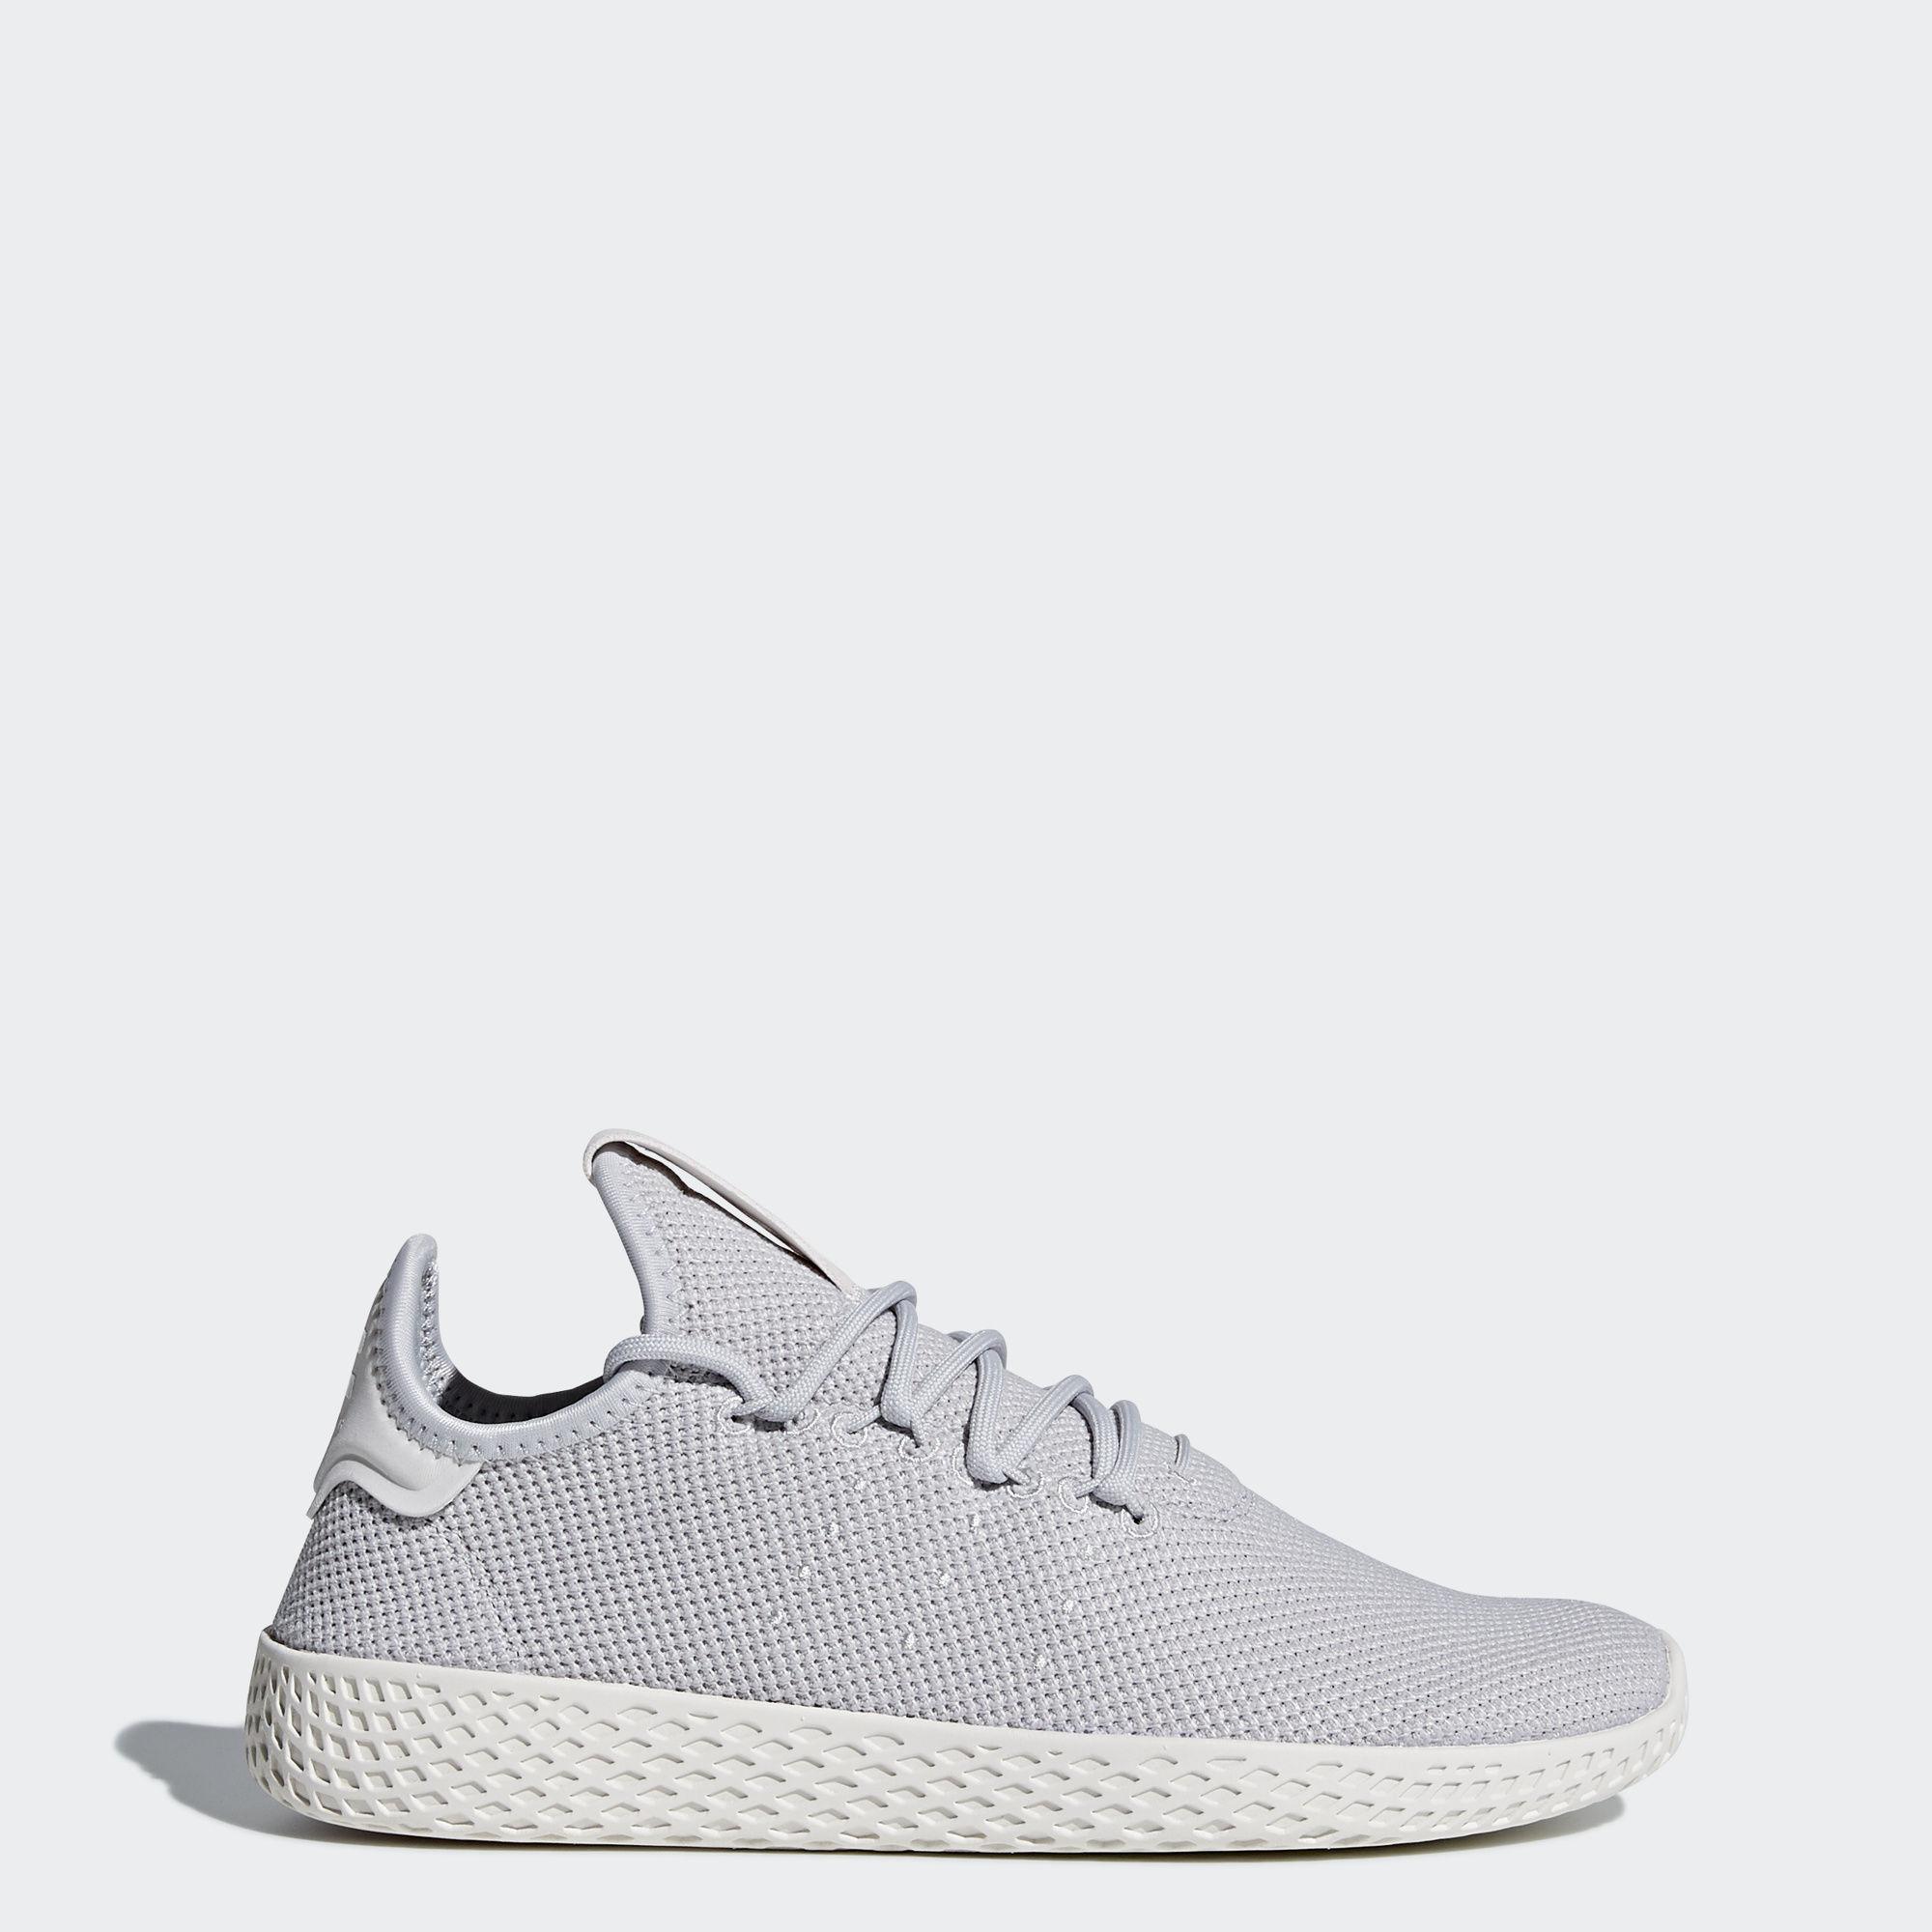 adidas pharrell grise une vente de liquidation de prix bas